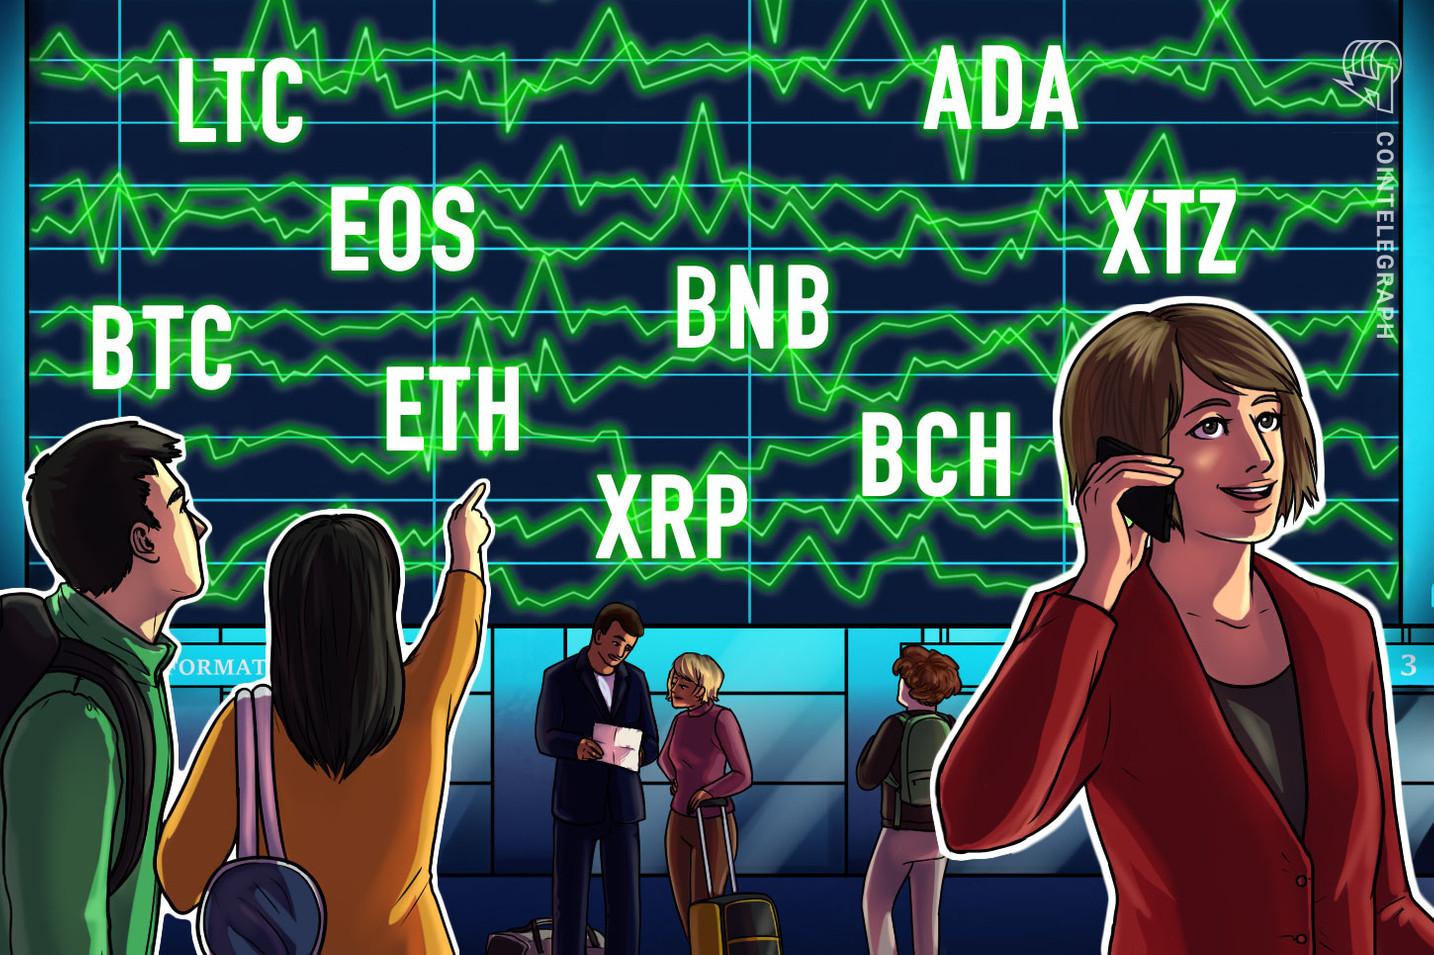 Price Analysis Feb 14: BTC, ETH, XRP, BCH, BSV, LTC, EOS, BNB, XTZ, ADA